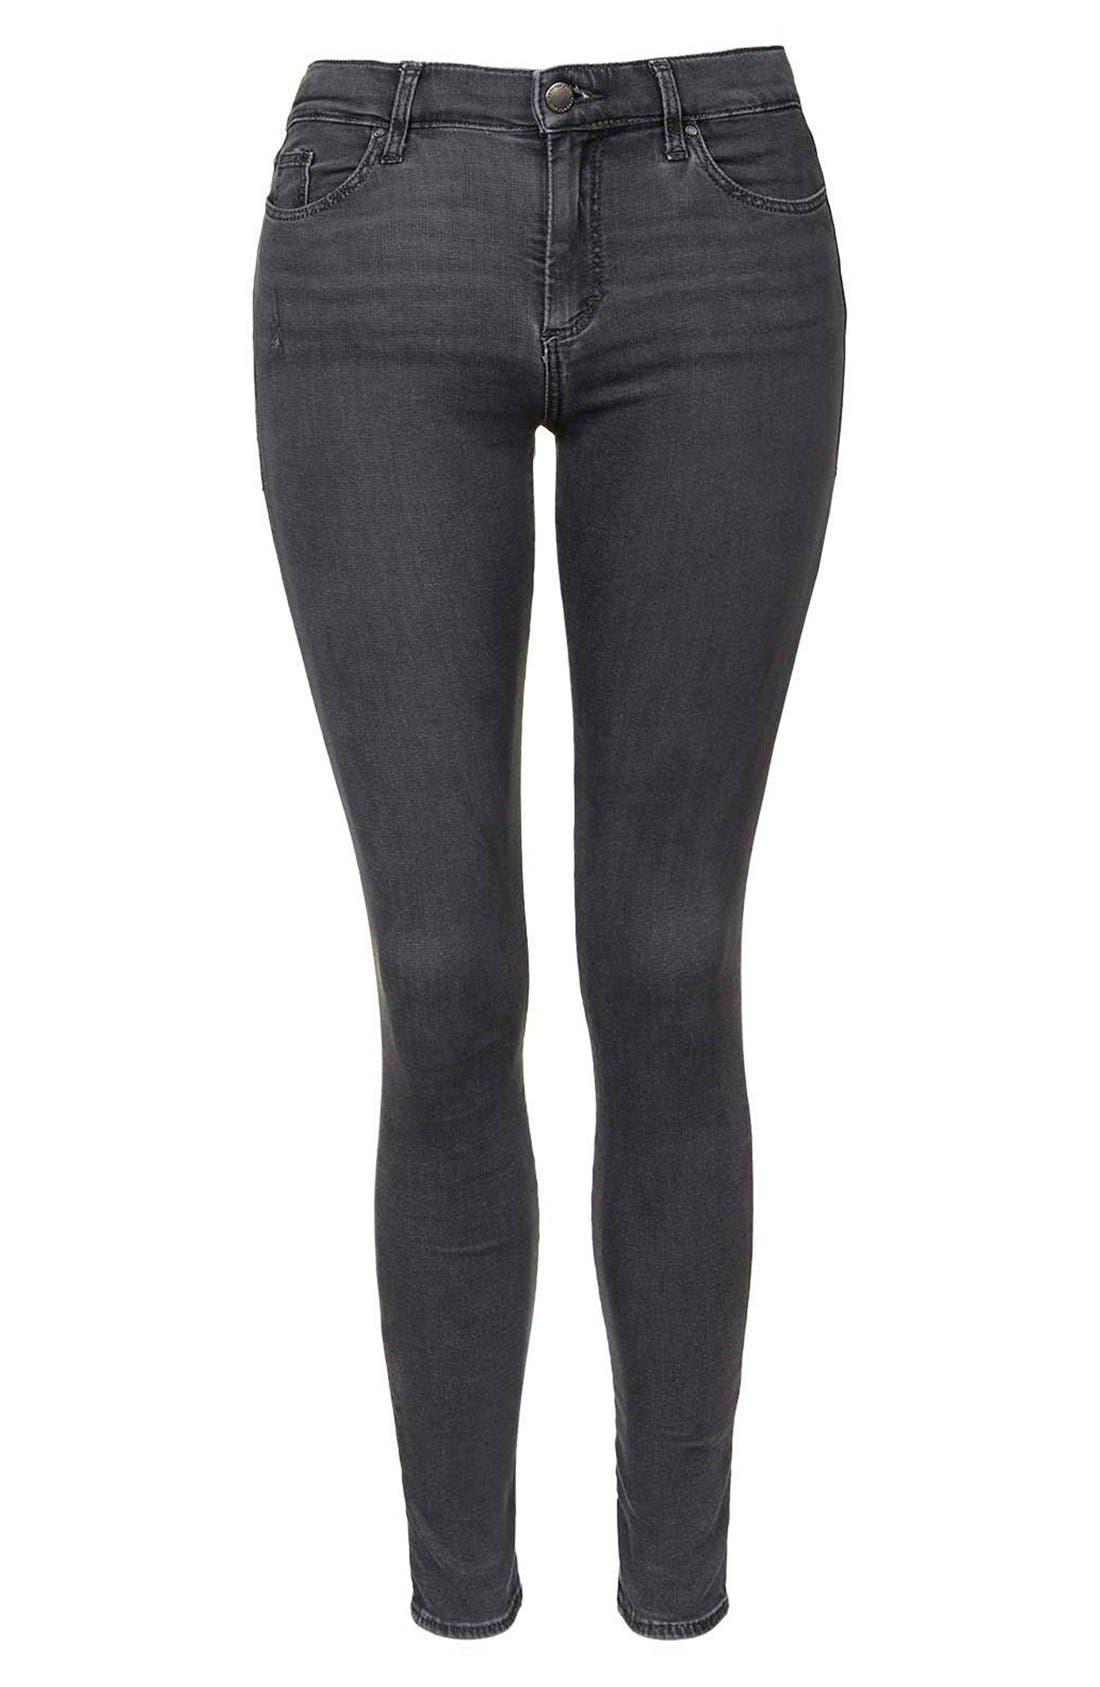 TOPSHOP, Moto 'Jamie' Skinny Jeans, Alternate thumbnail 2, color, 020